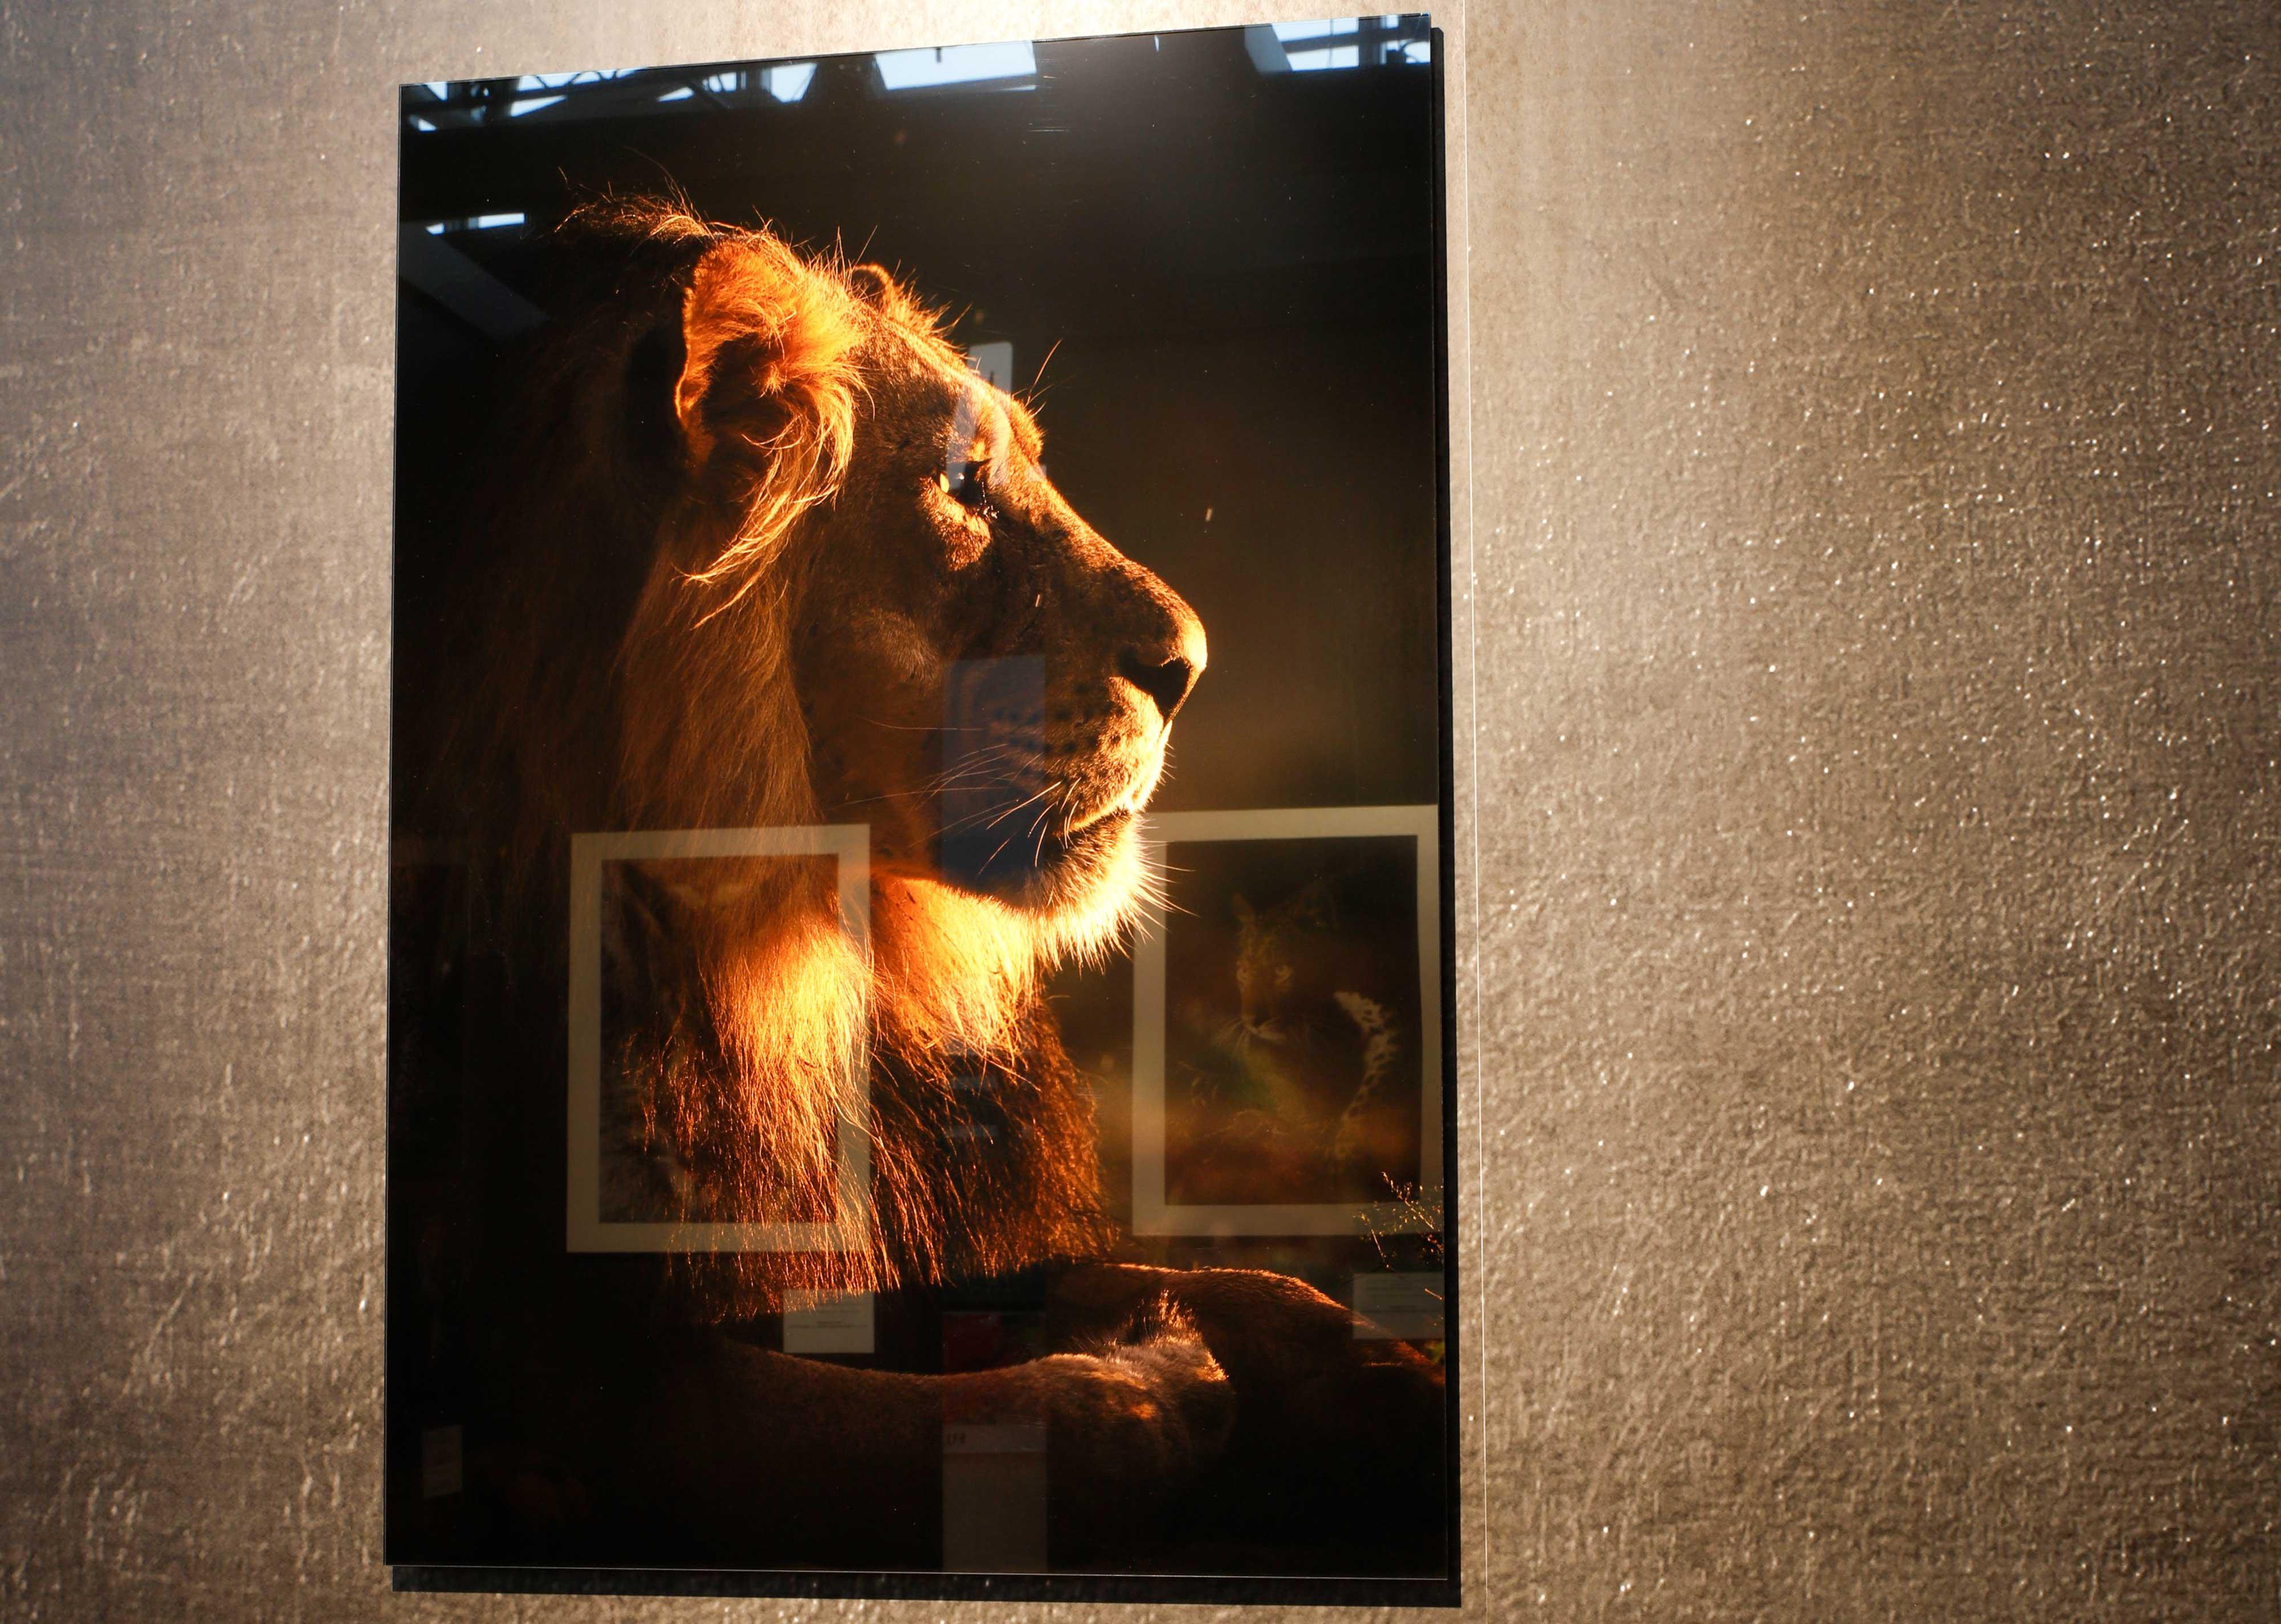 kaschiermaschine_fotos_acrylglas